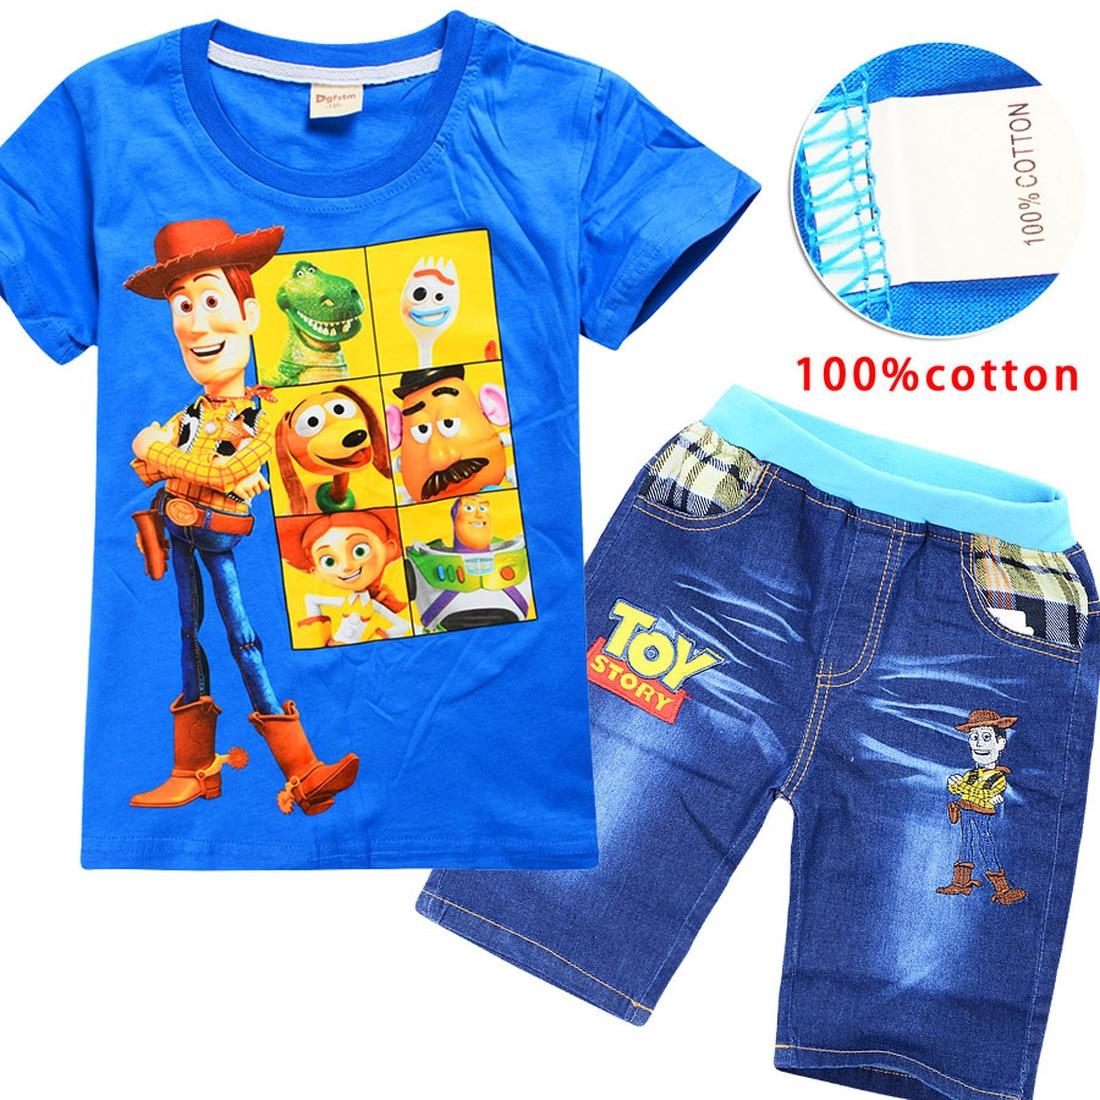 Kids Summer Boys Clothes Sport Suit Set 2019 Christmas Toy Story 4, Short Sleeve Children's Clothing Set 2 Pieces T-Shirt+Pants